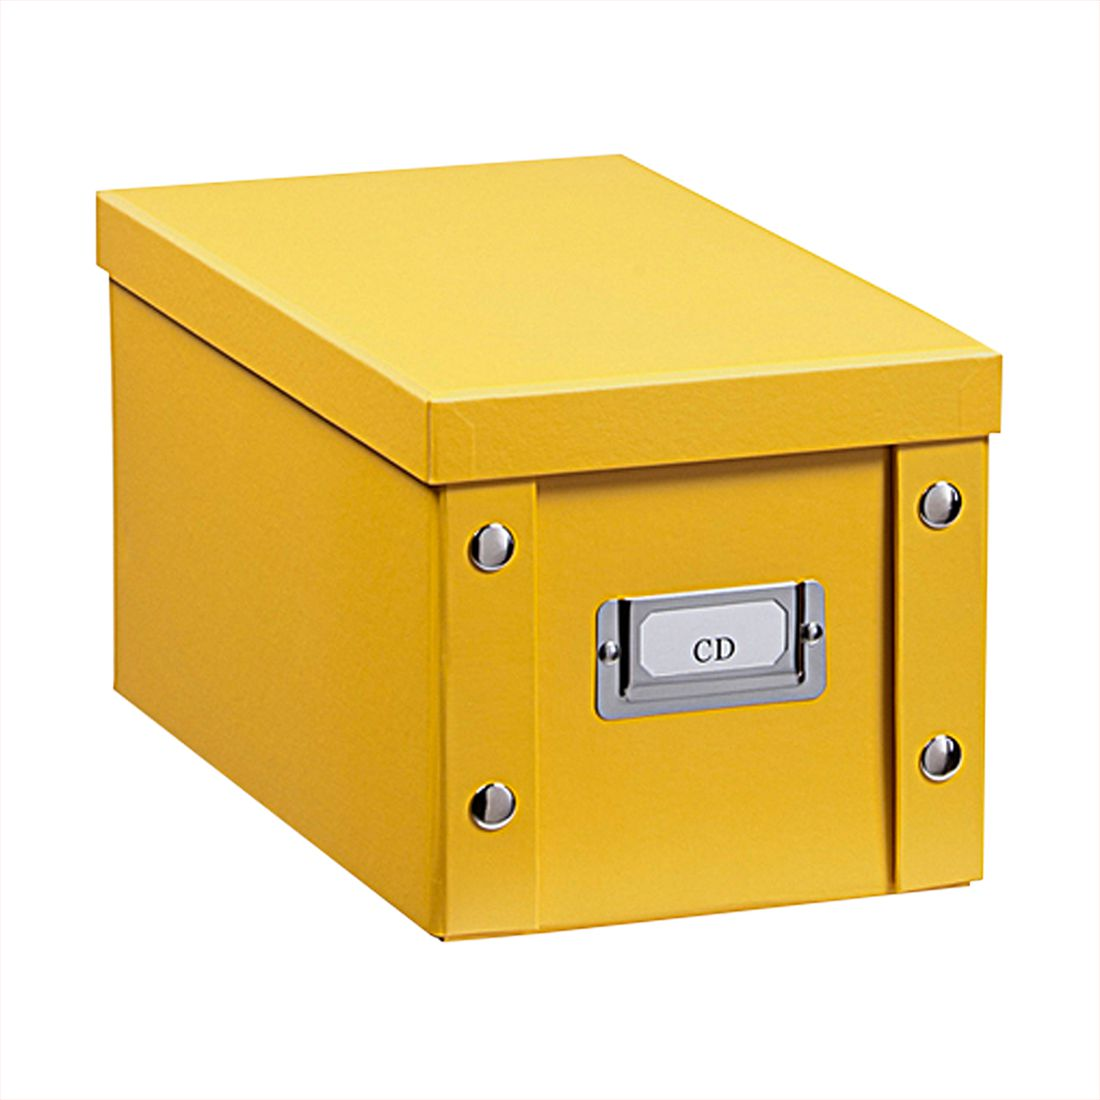 CD-Box Pappe – Pappe Mango, Zeller online bestellen